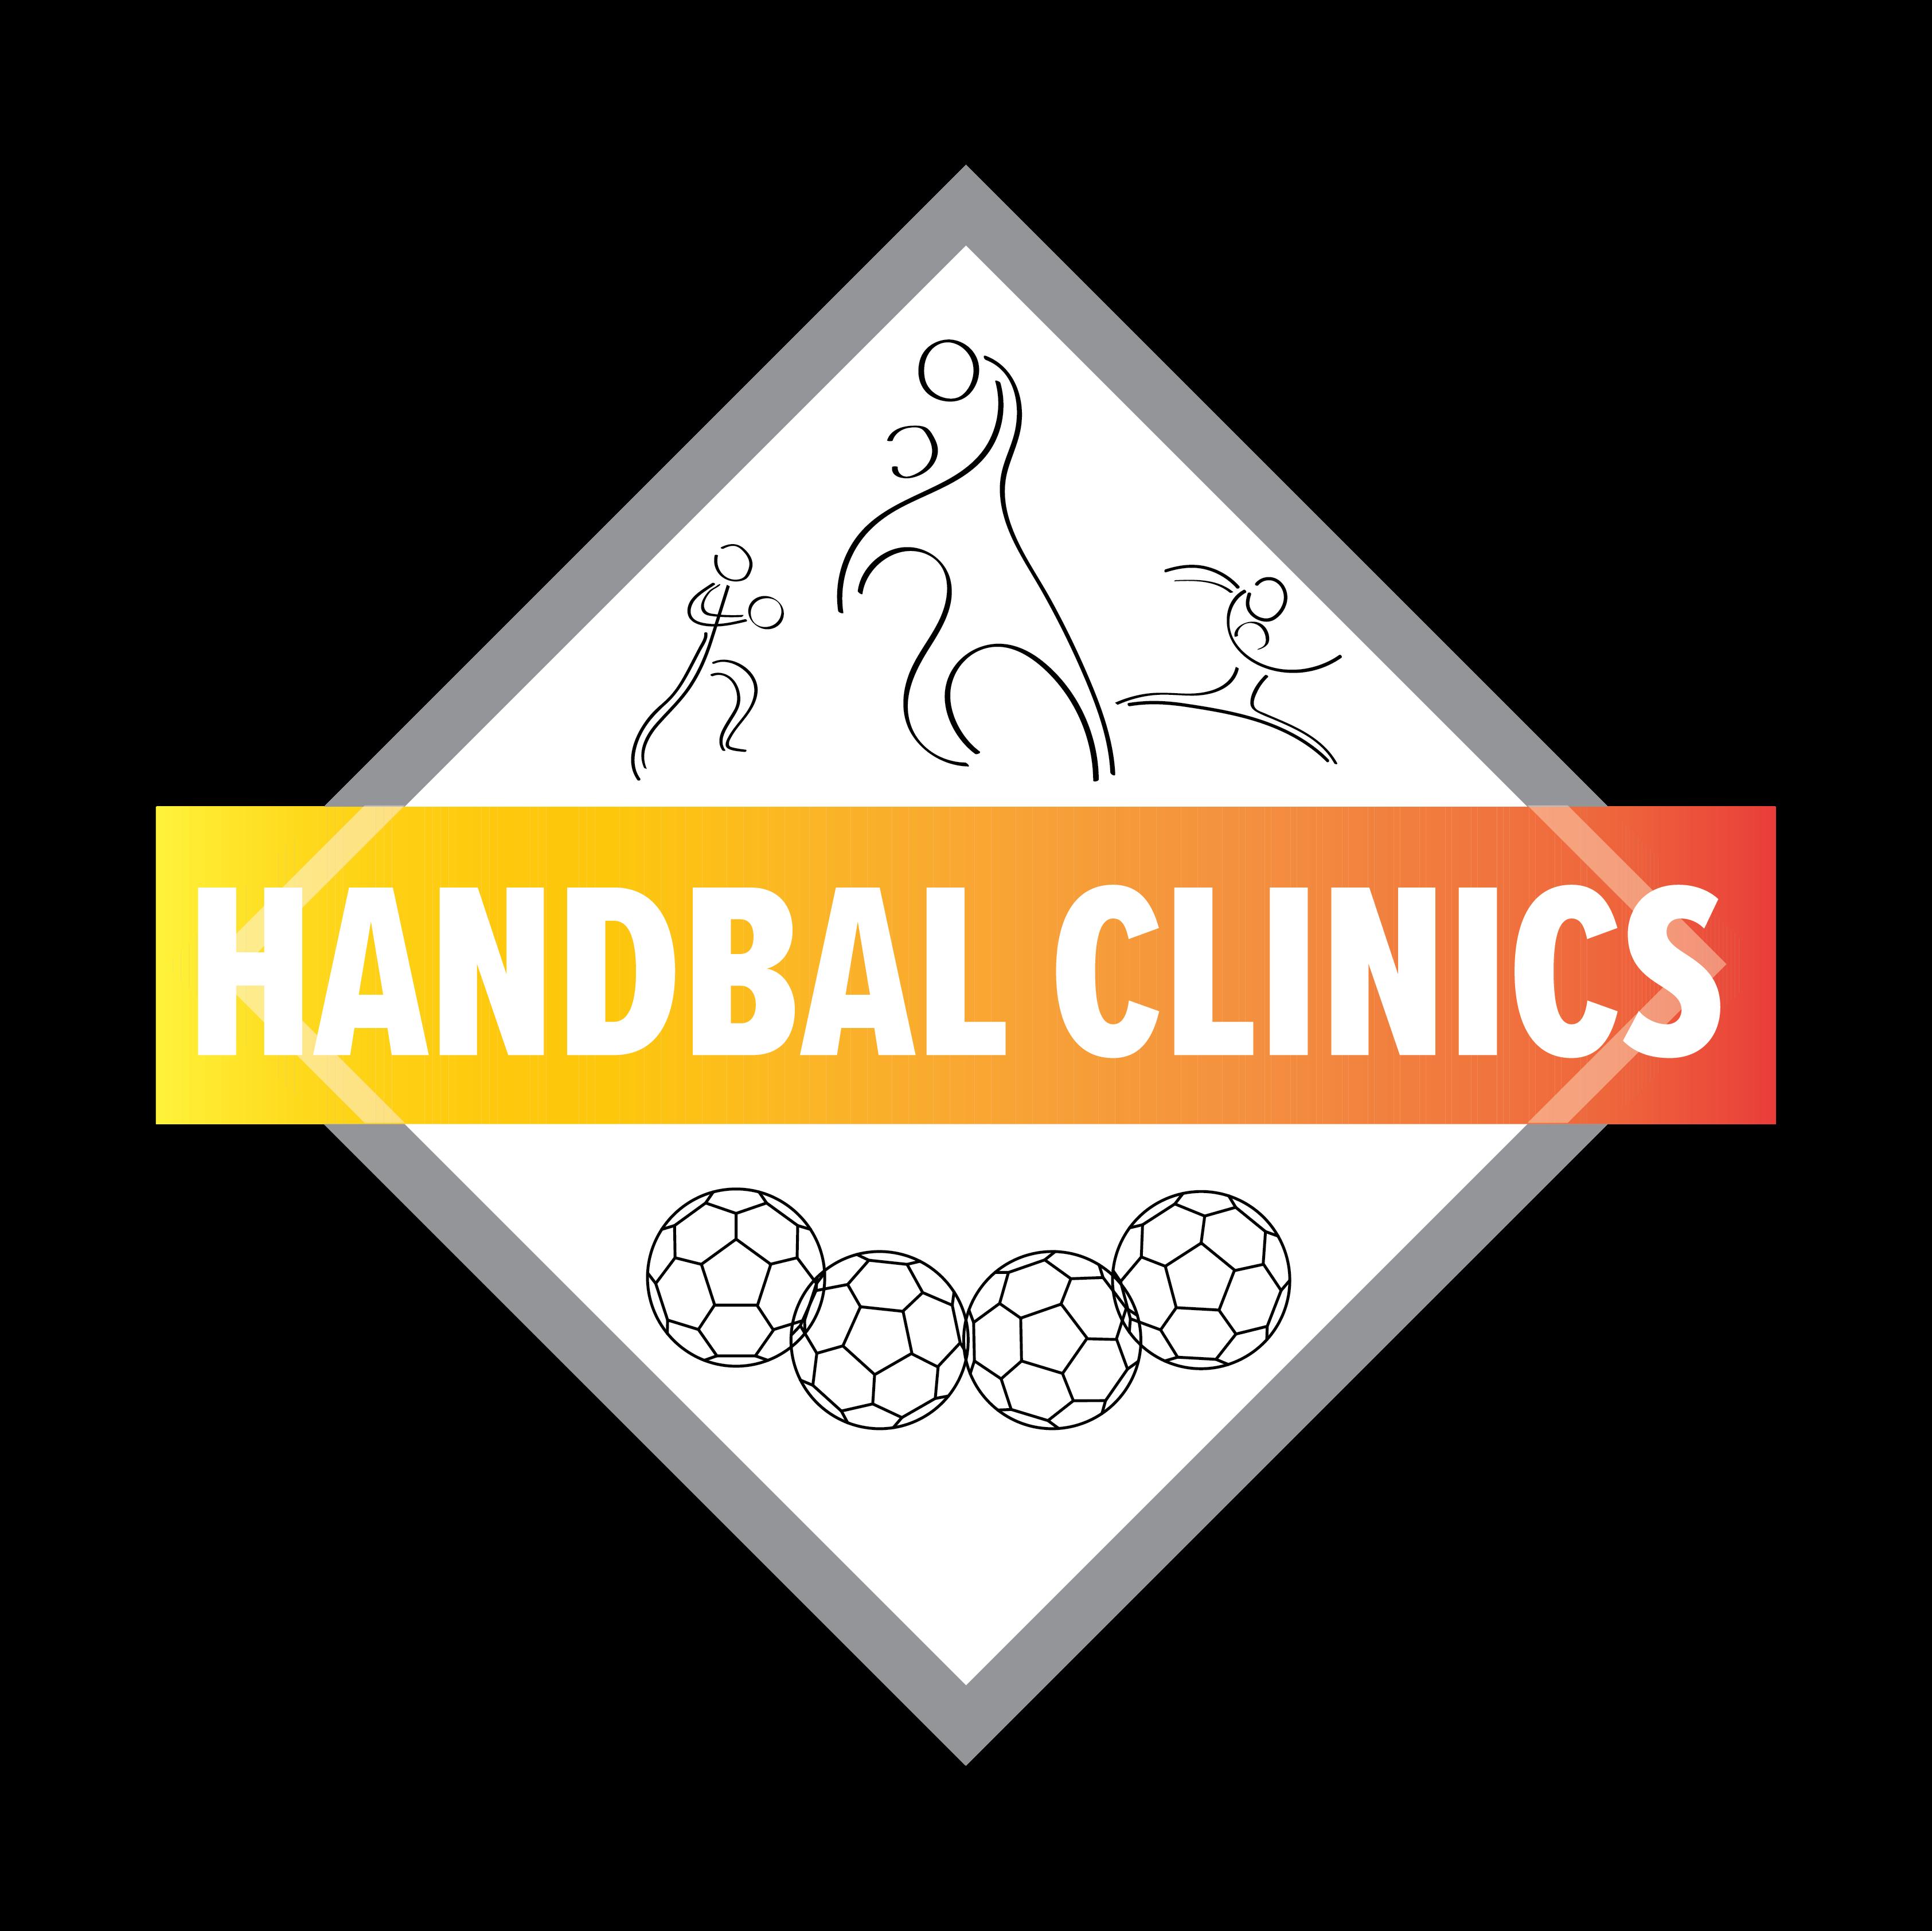 Handbal Clinics